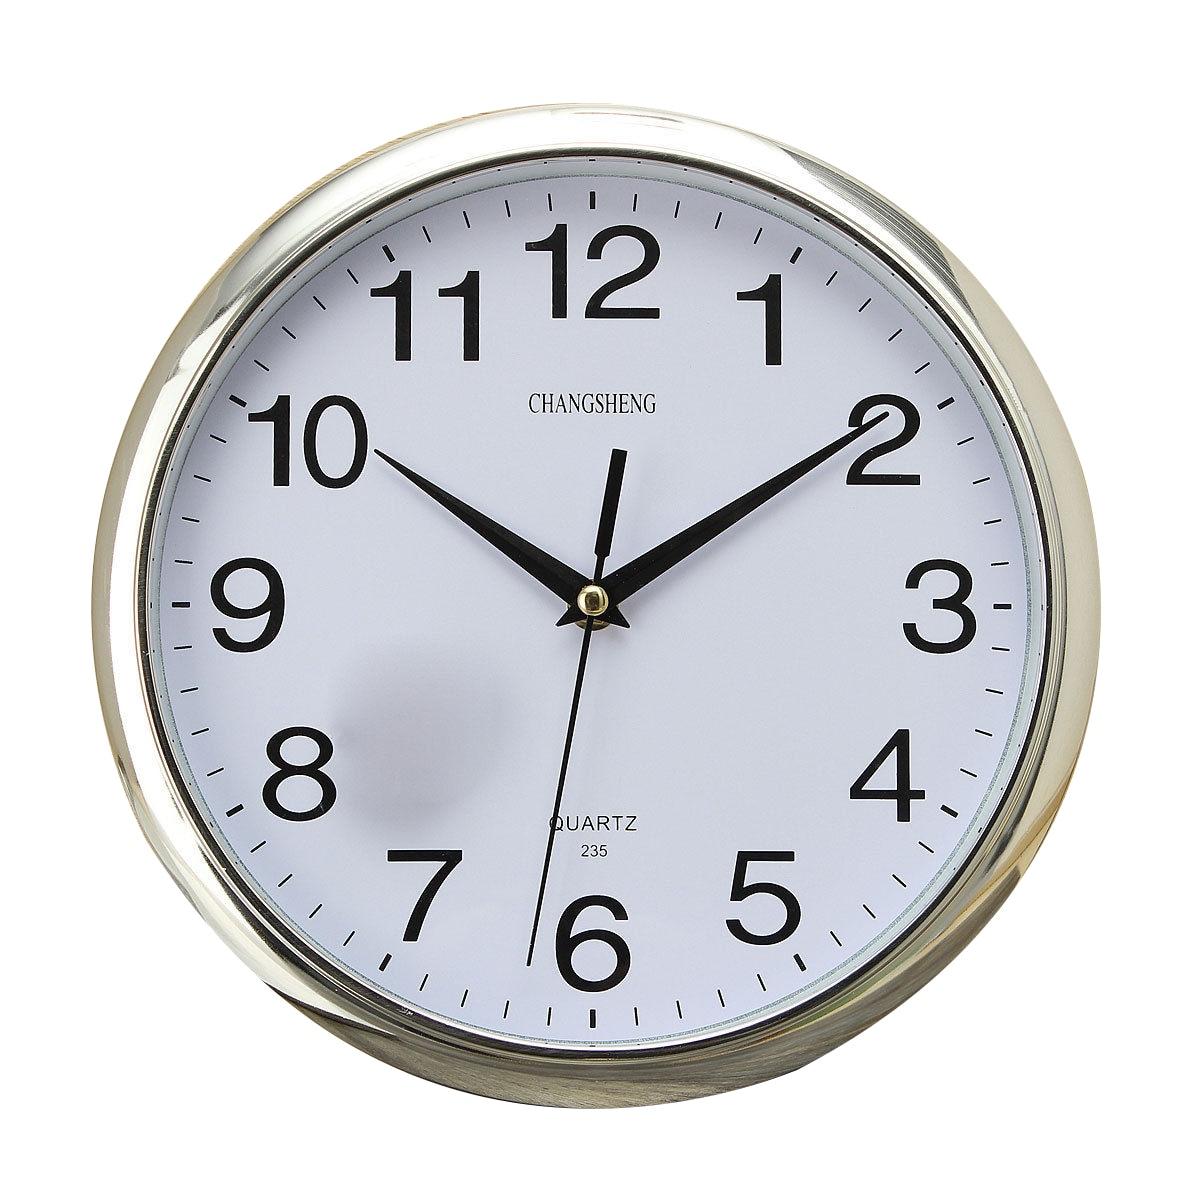 large vintage round modern home bedroom retro time kitchen wall clock quartz sliverchina